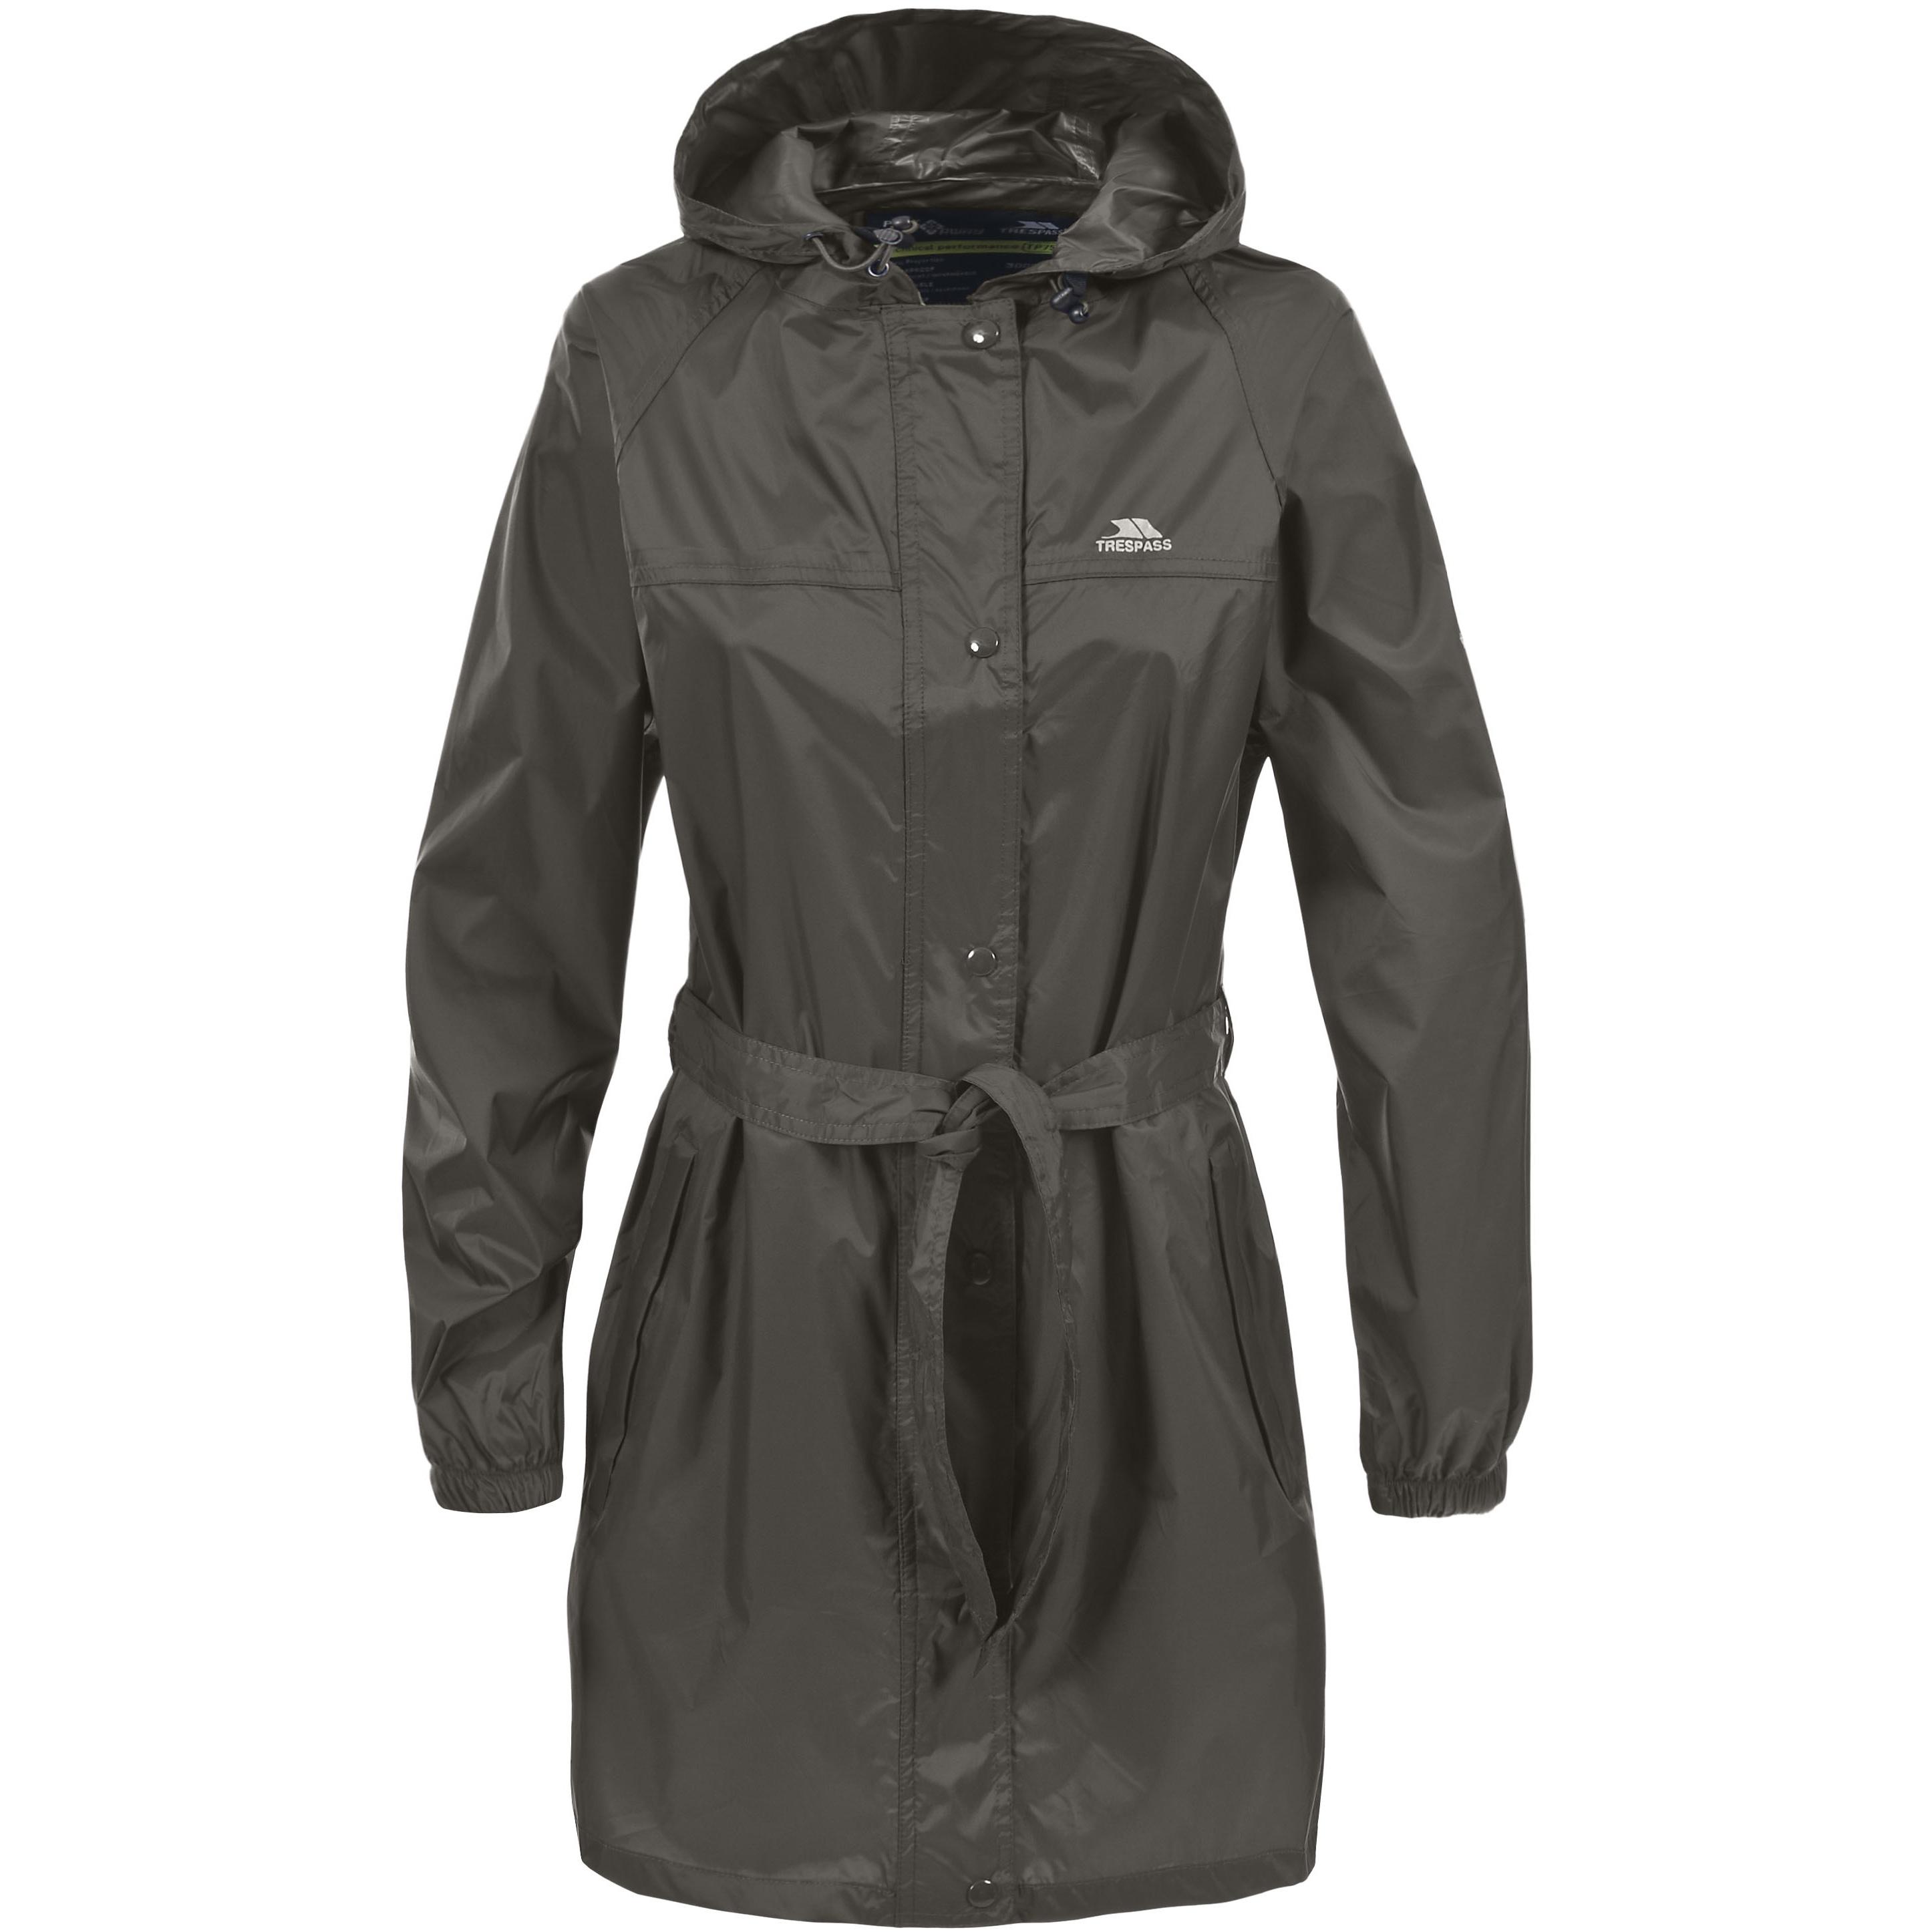 Womens waterproof jacket sale